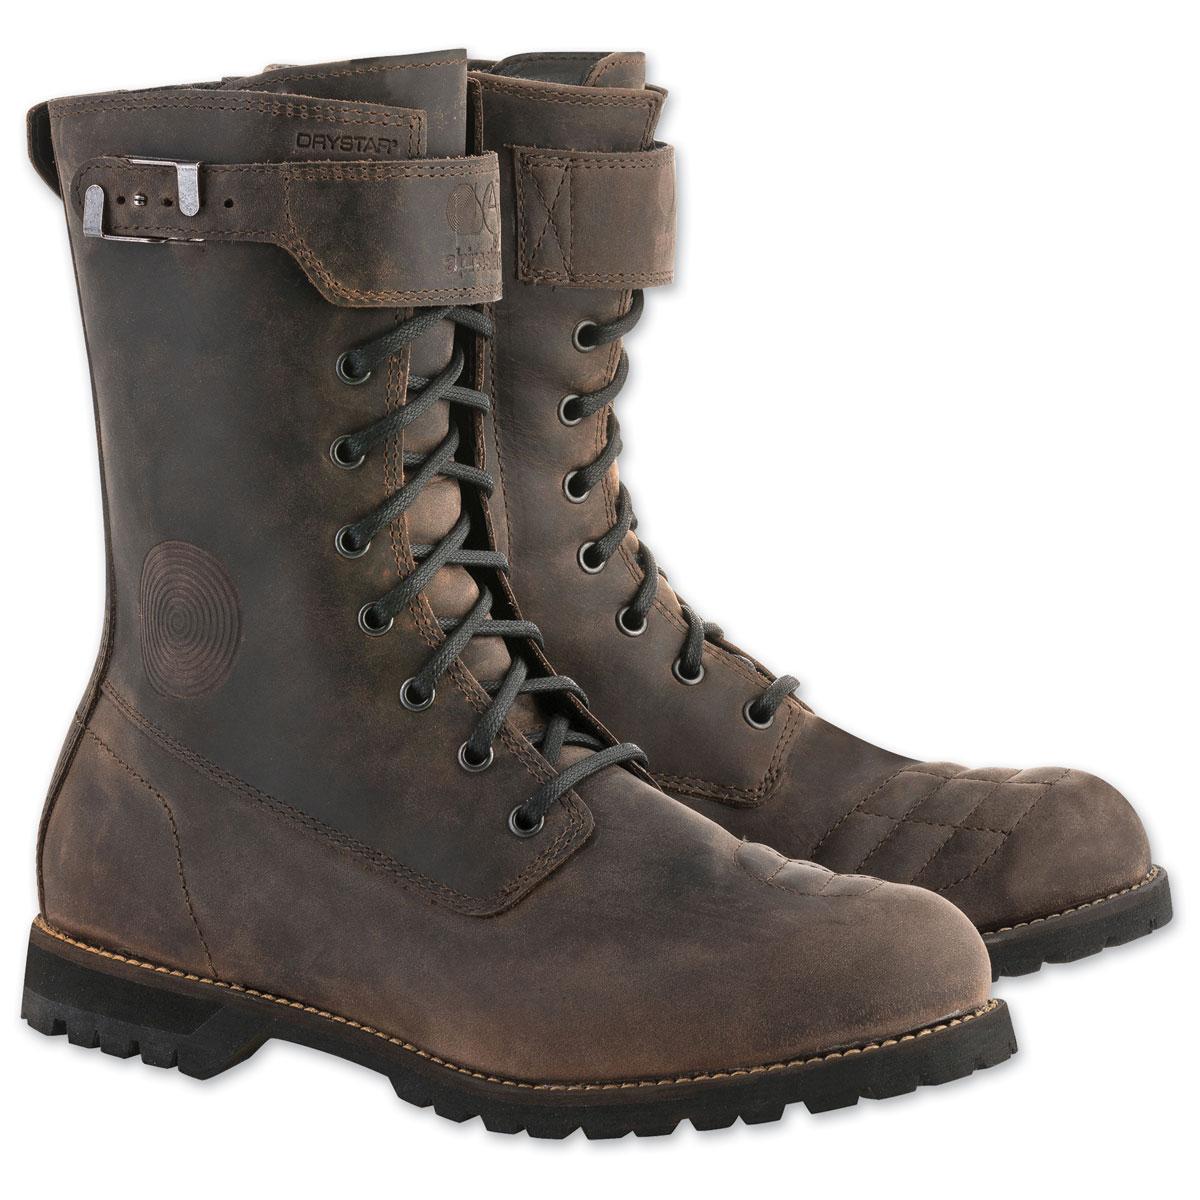 Alpinestars Men's Firm Brown Boots